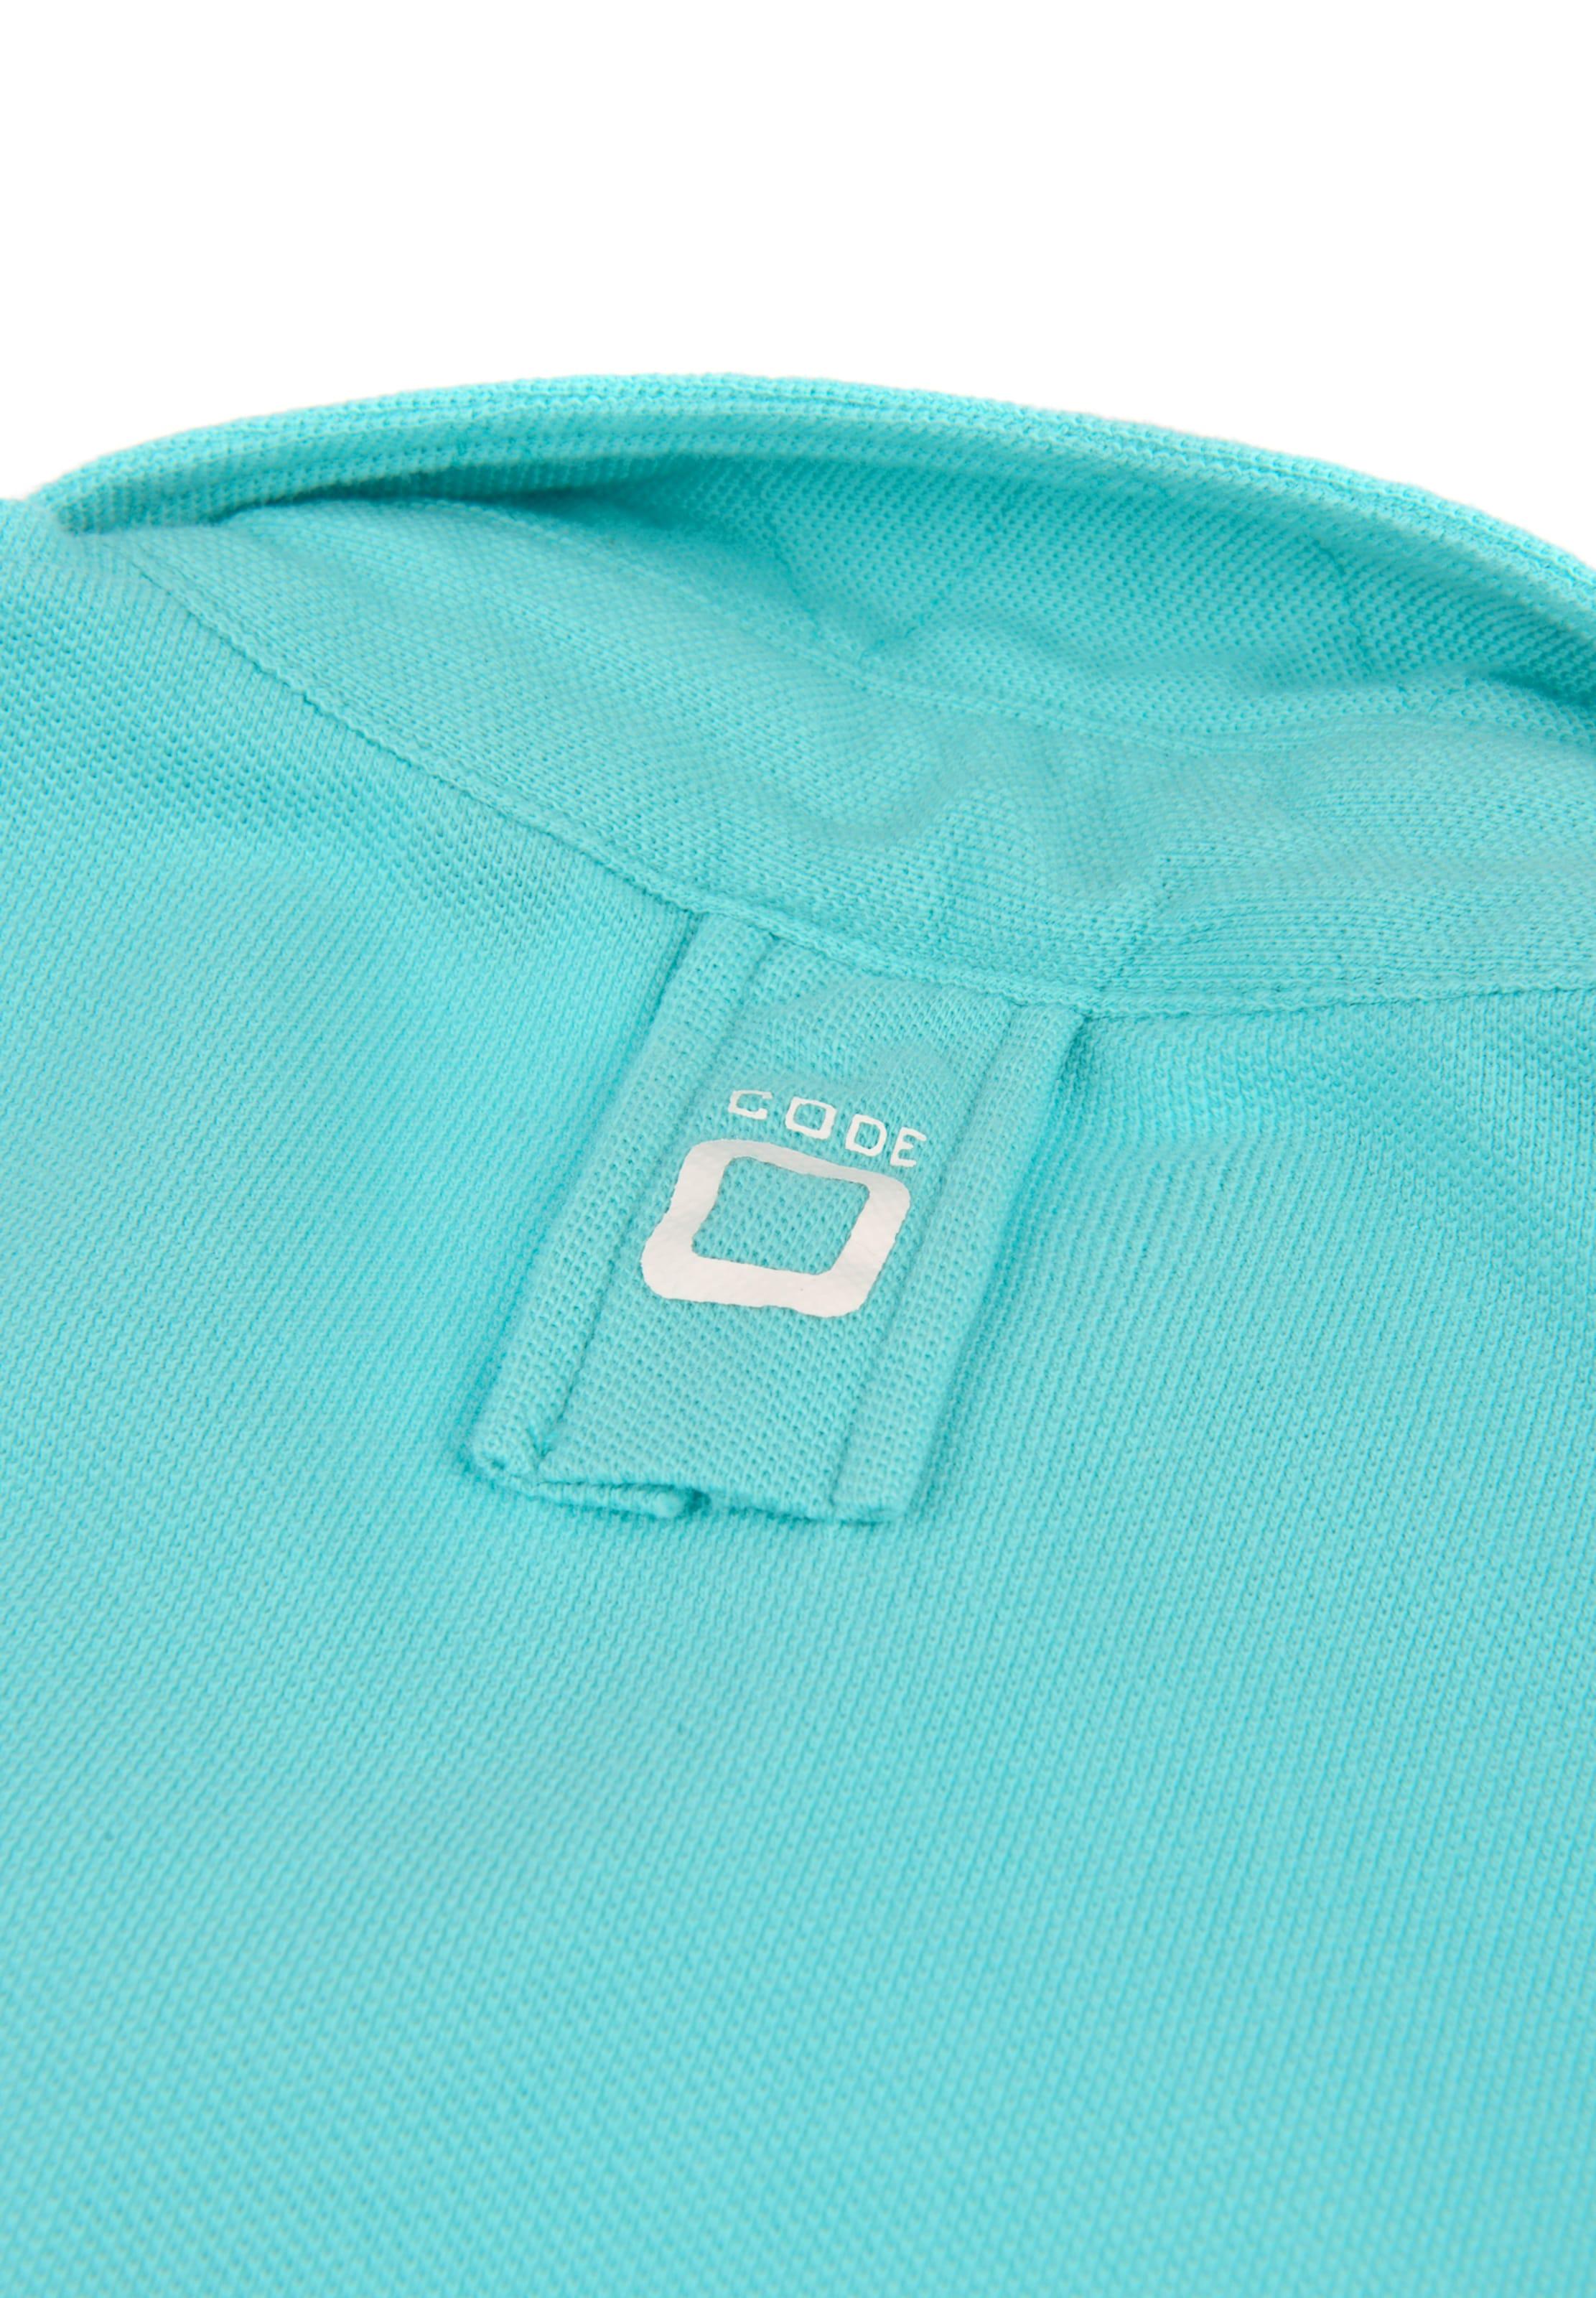 Drifter s Poloshirts Polo Mischfarben zero L In Code SpqUMVz